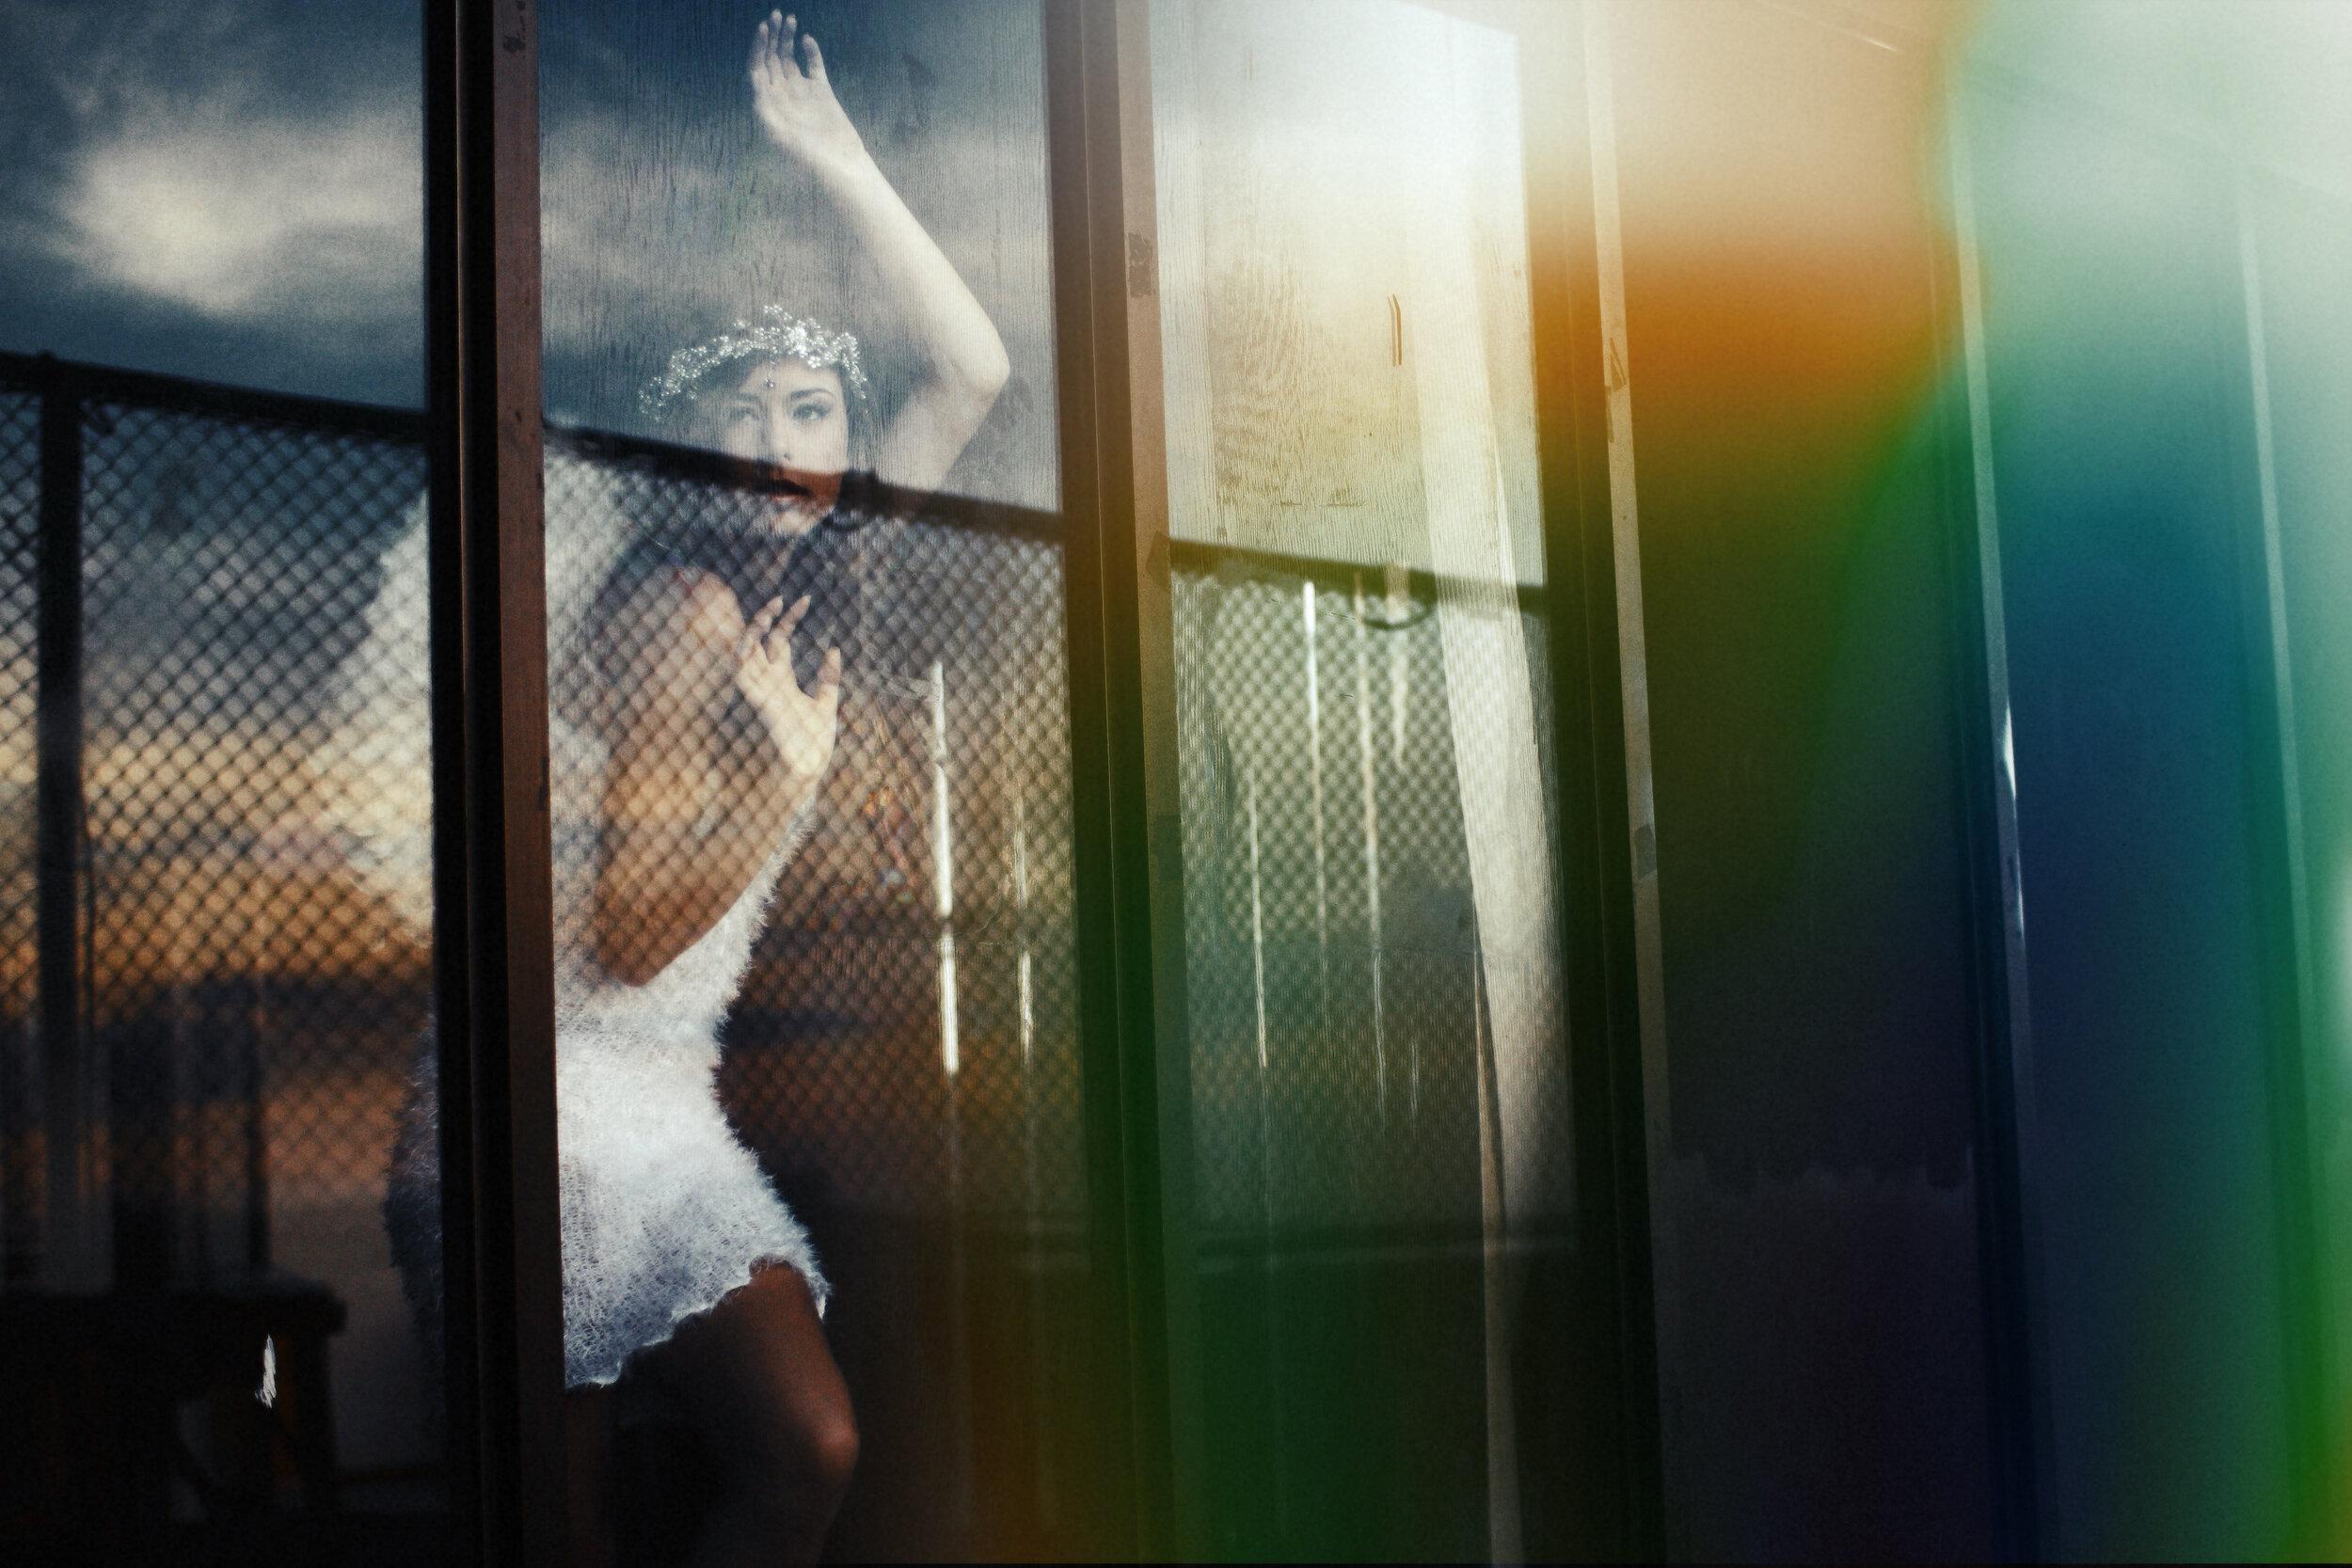 Luane Passinato, DJ and model